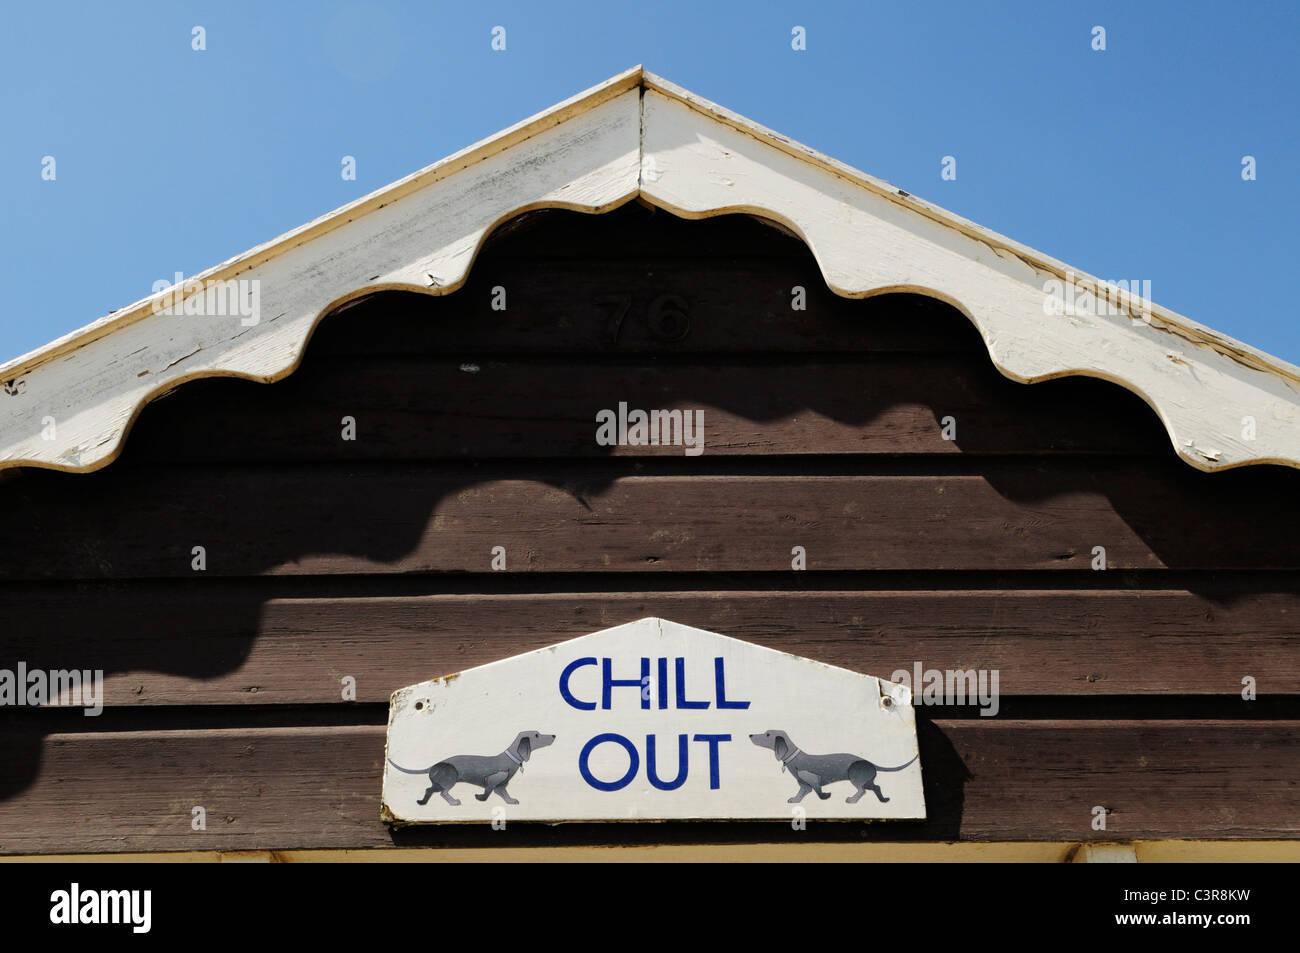 Chill Out Beach Hut detail, Southwold, Suffolk, England, UK - Stock Image